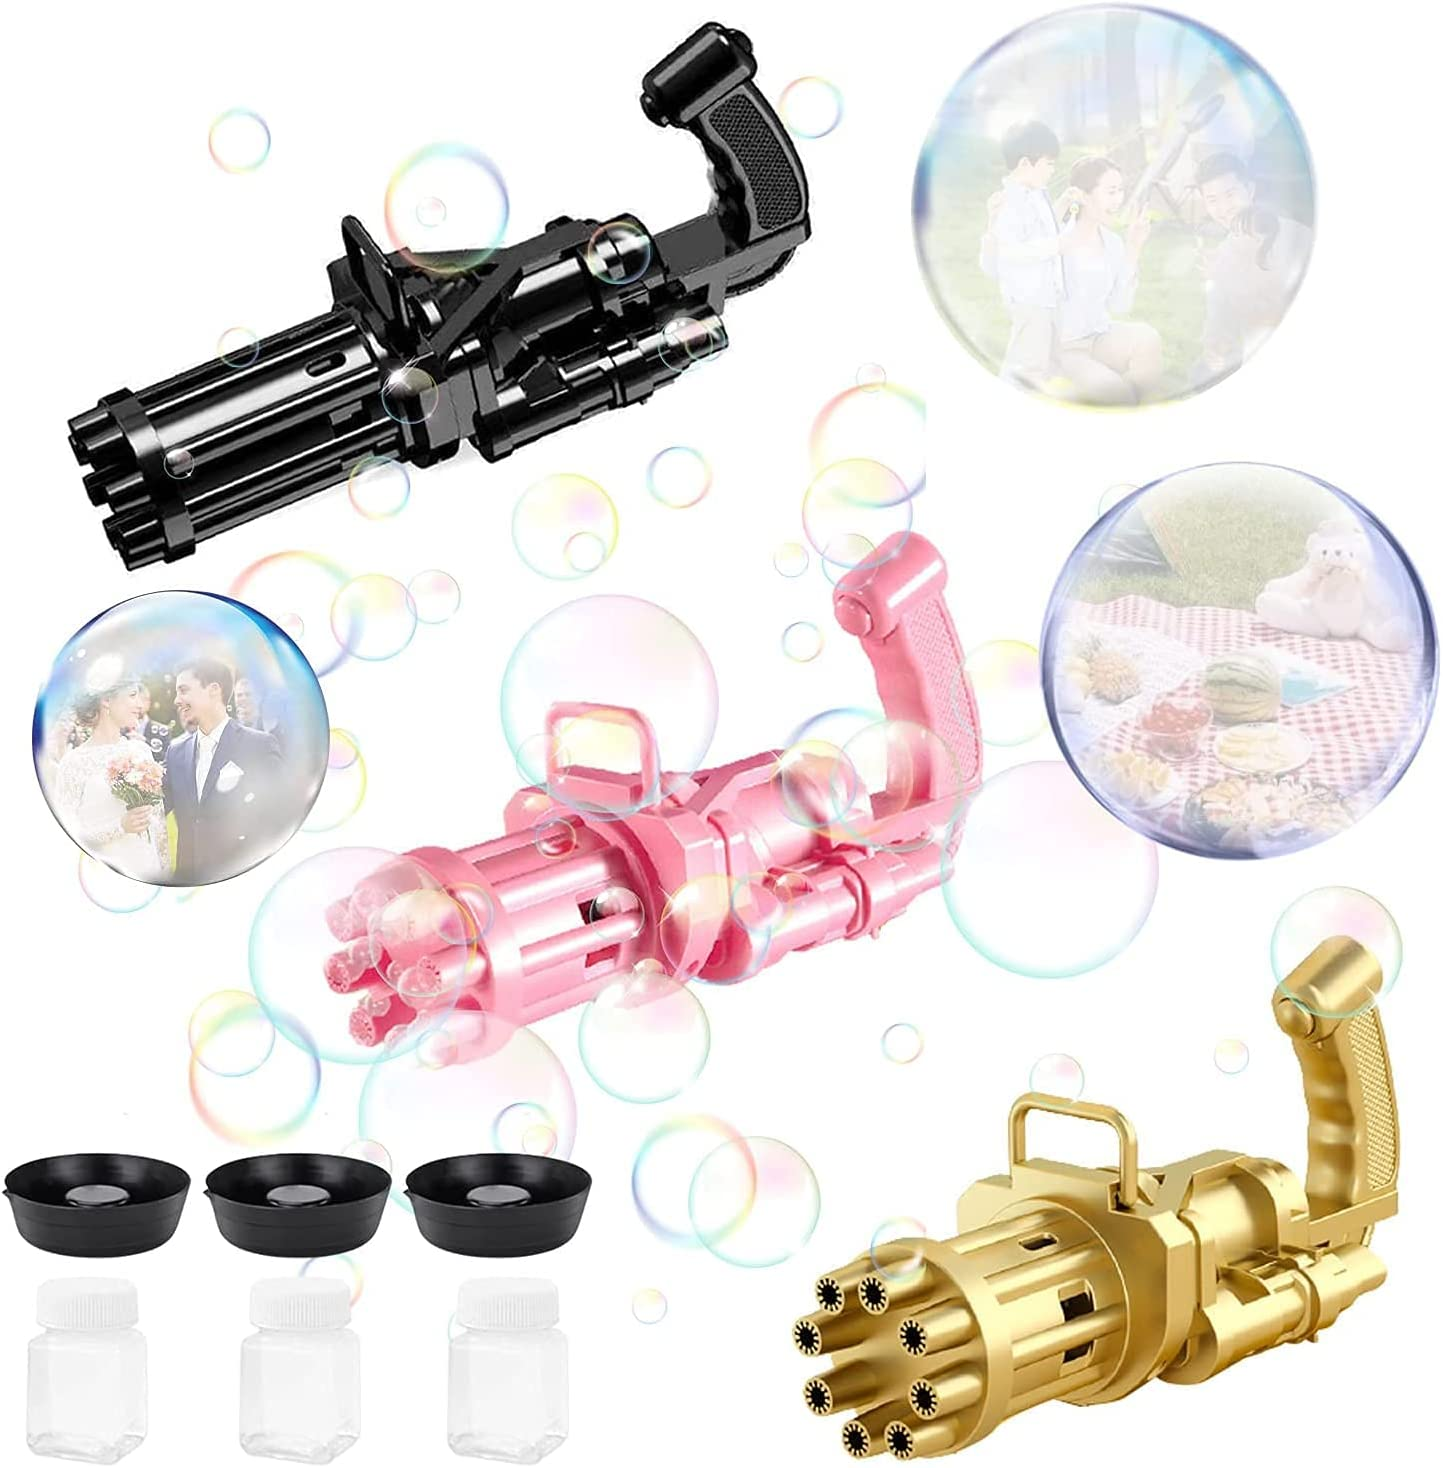 Gatling Bubble Machine Gun 2021 All items free shipping ABtakkat 8 Electri Inexpensive Holes Newest